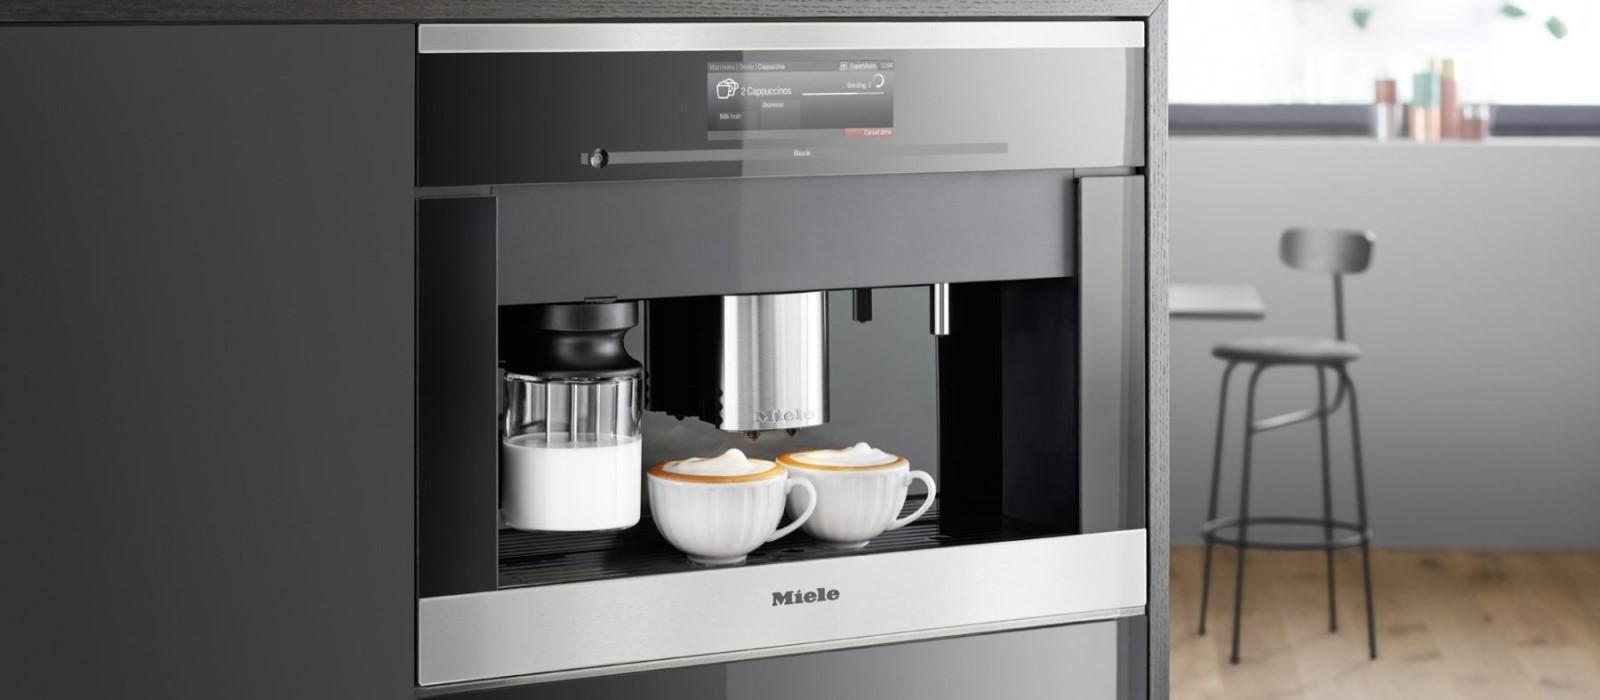 miele - coffee machine